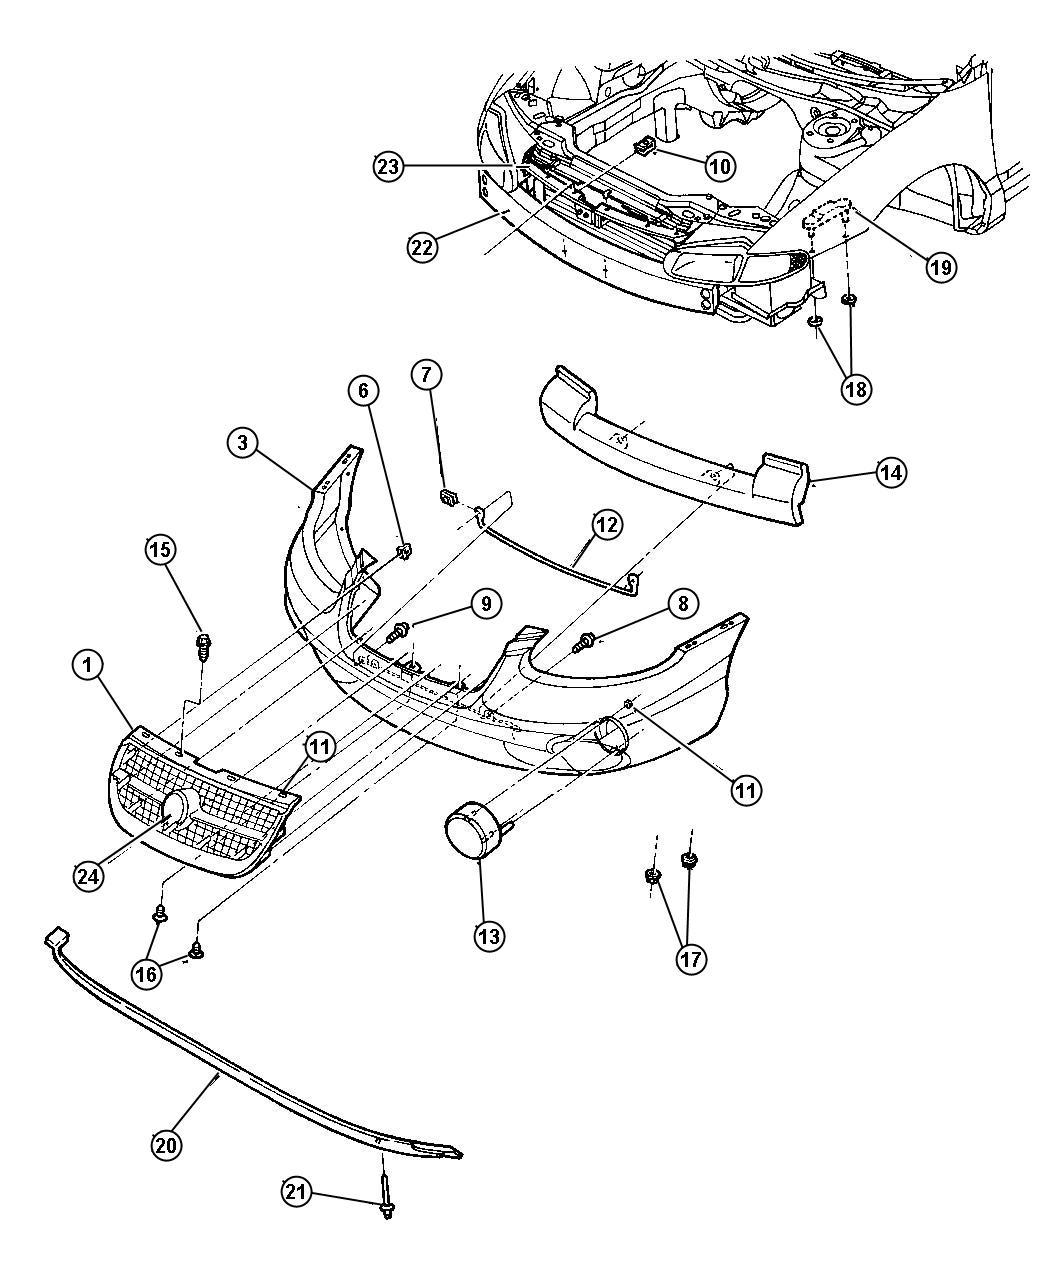 Chrysler Sebring Convertible Parts